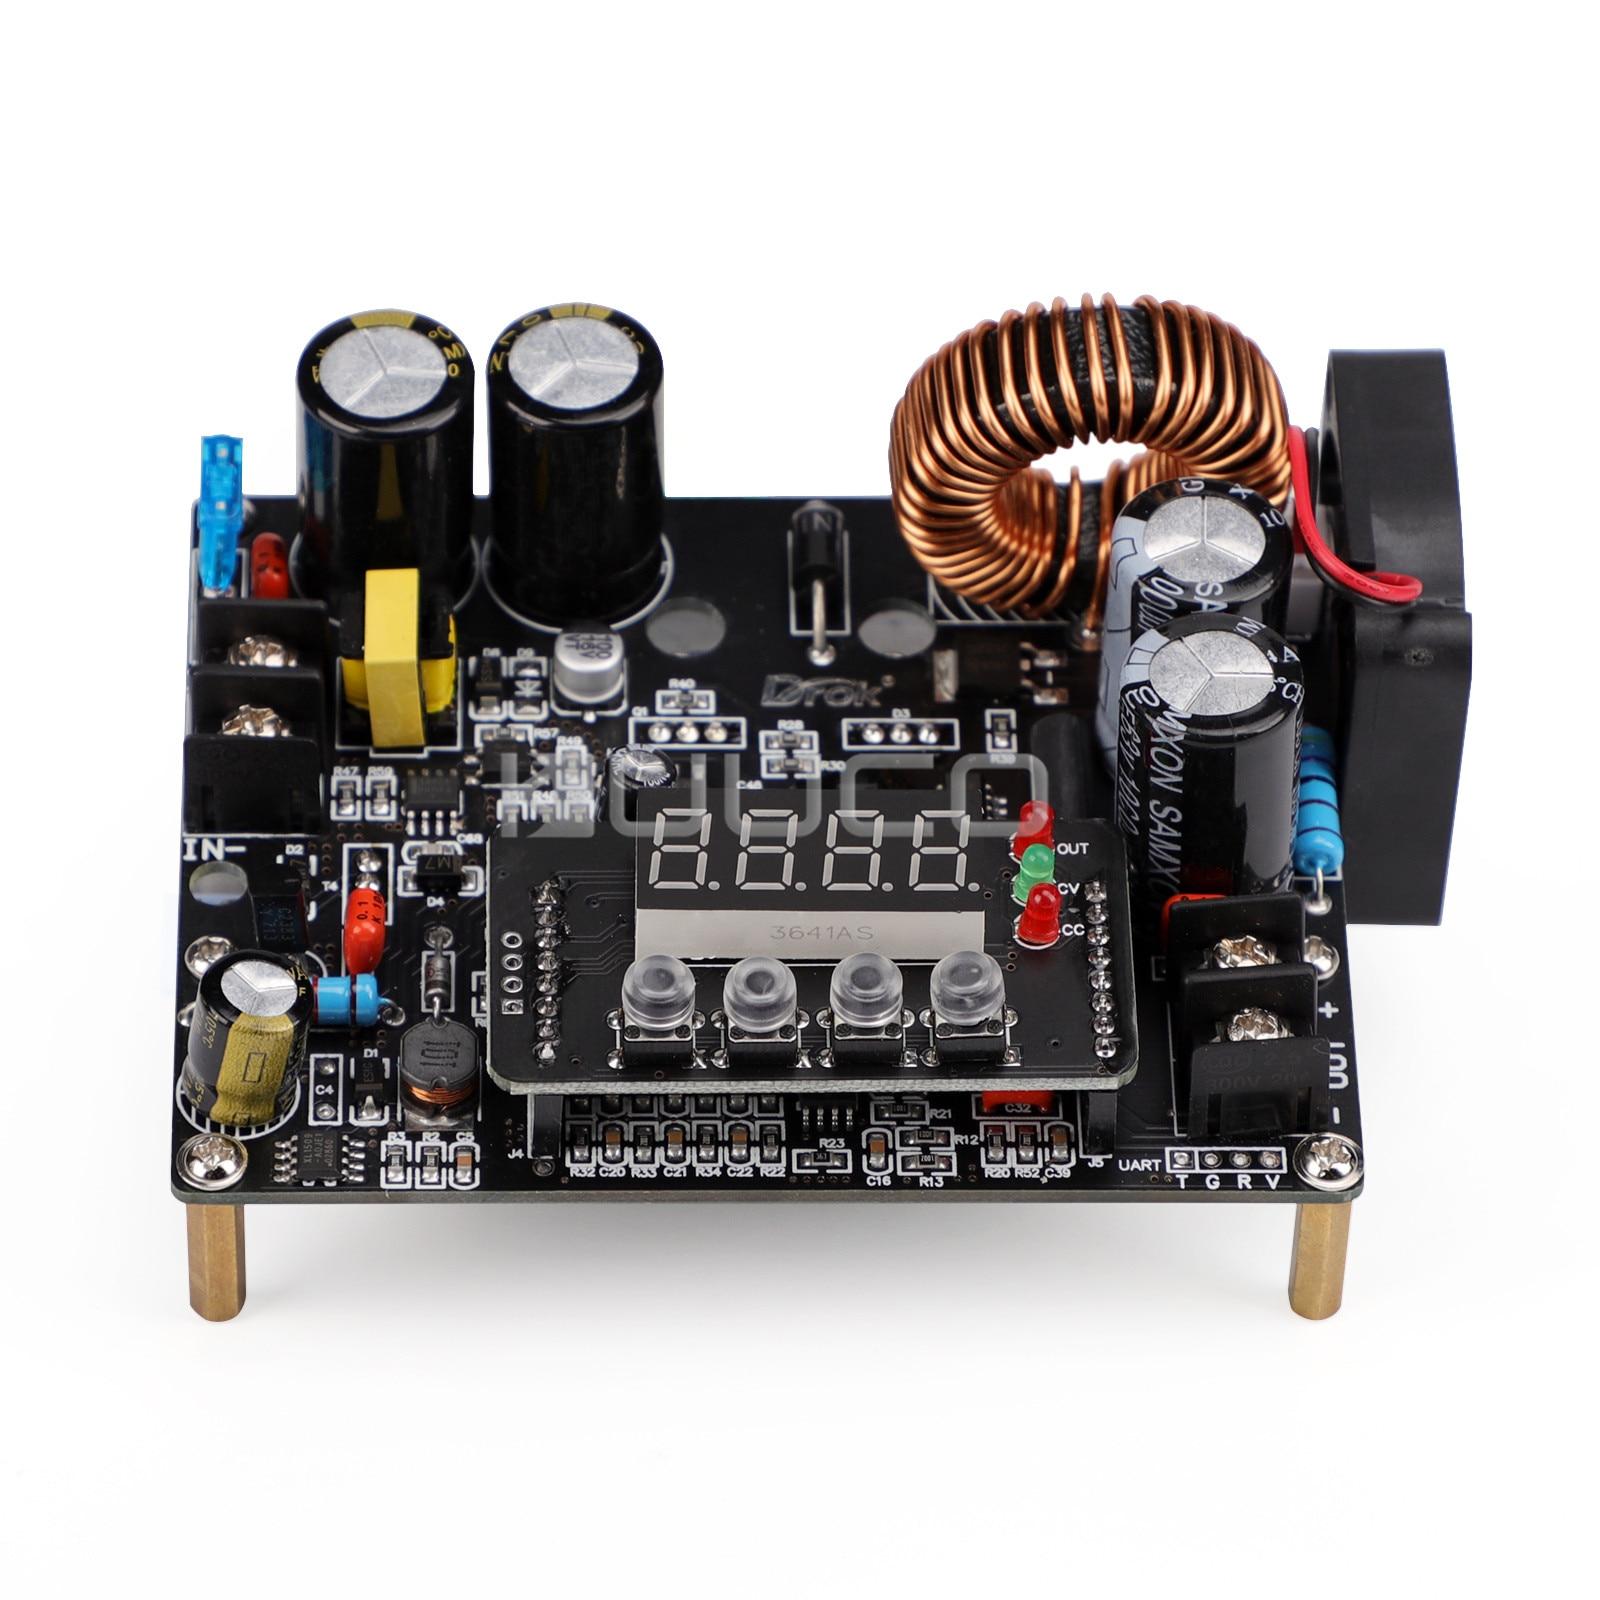 DROK Digital Buck Power Supply Module DC 10V~65V to 0~60V 12A 720W Voltage Regulator CNC Controller 12V 24V 36V 48V Adapter